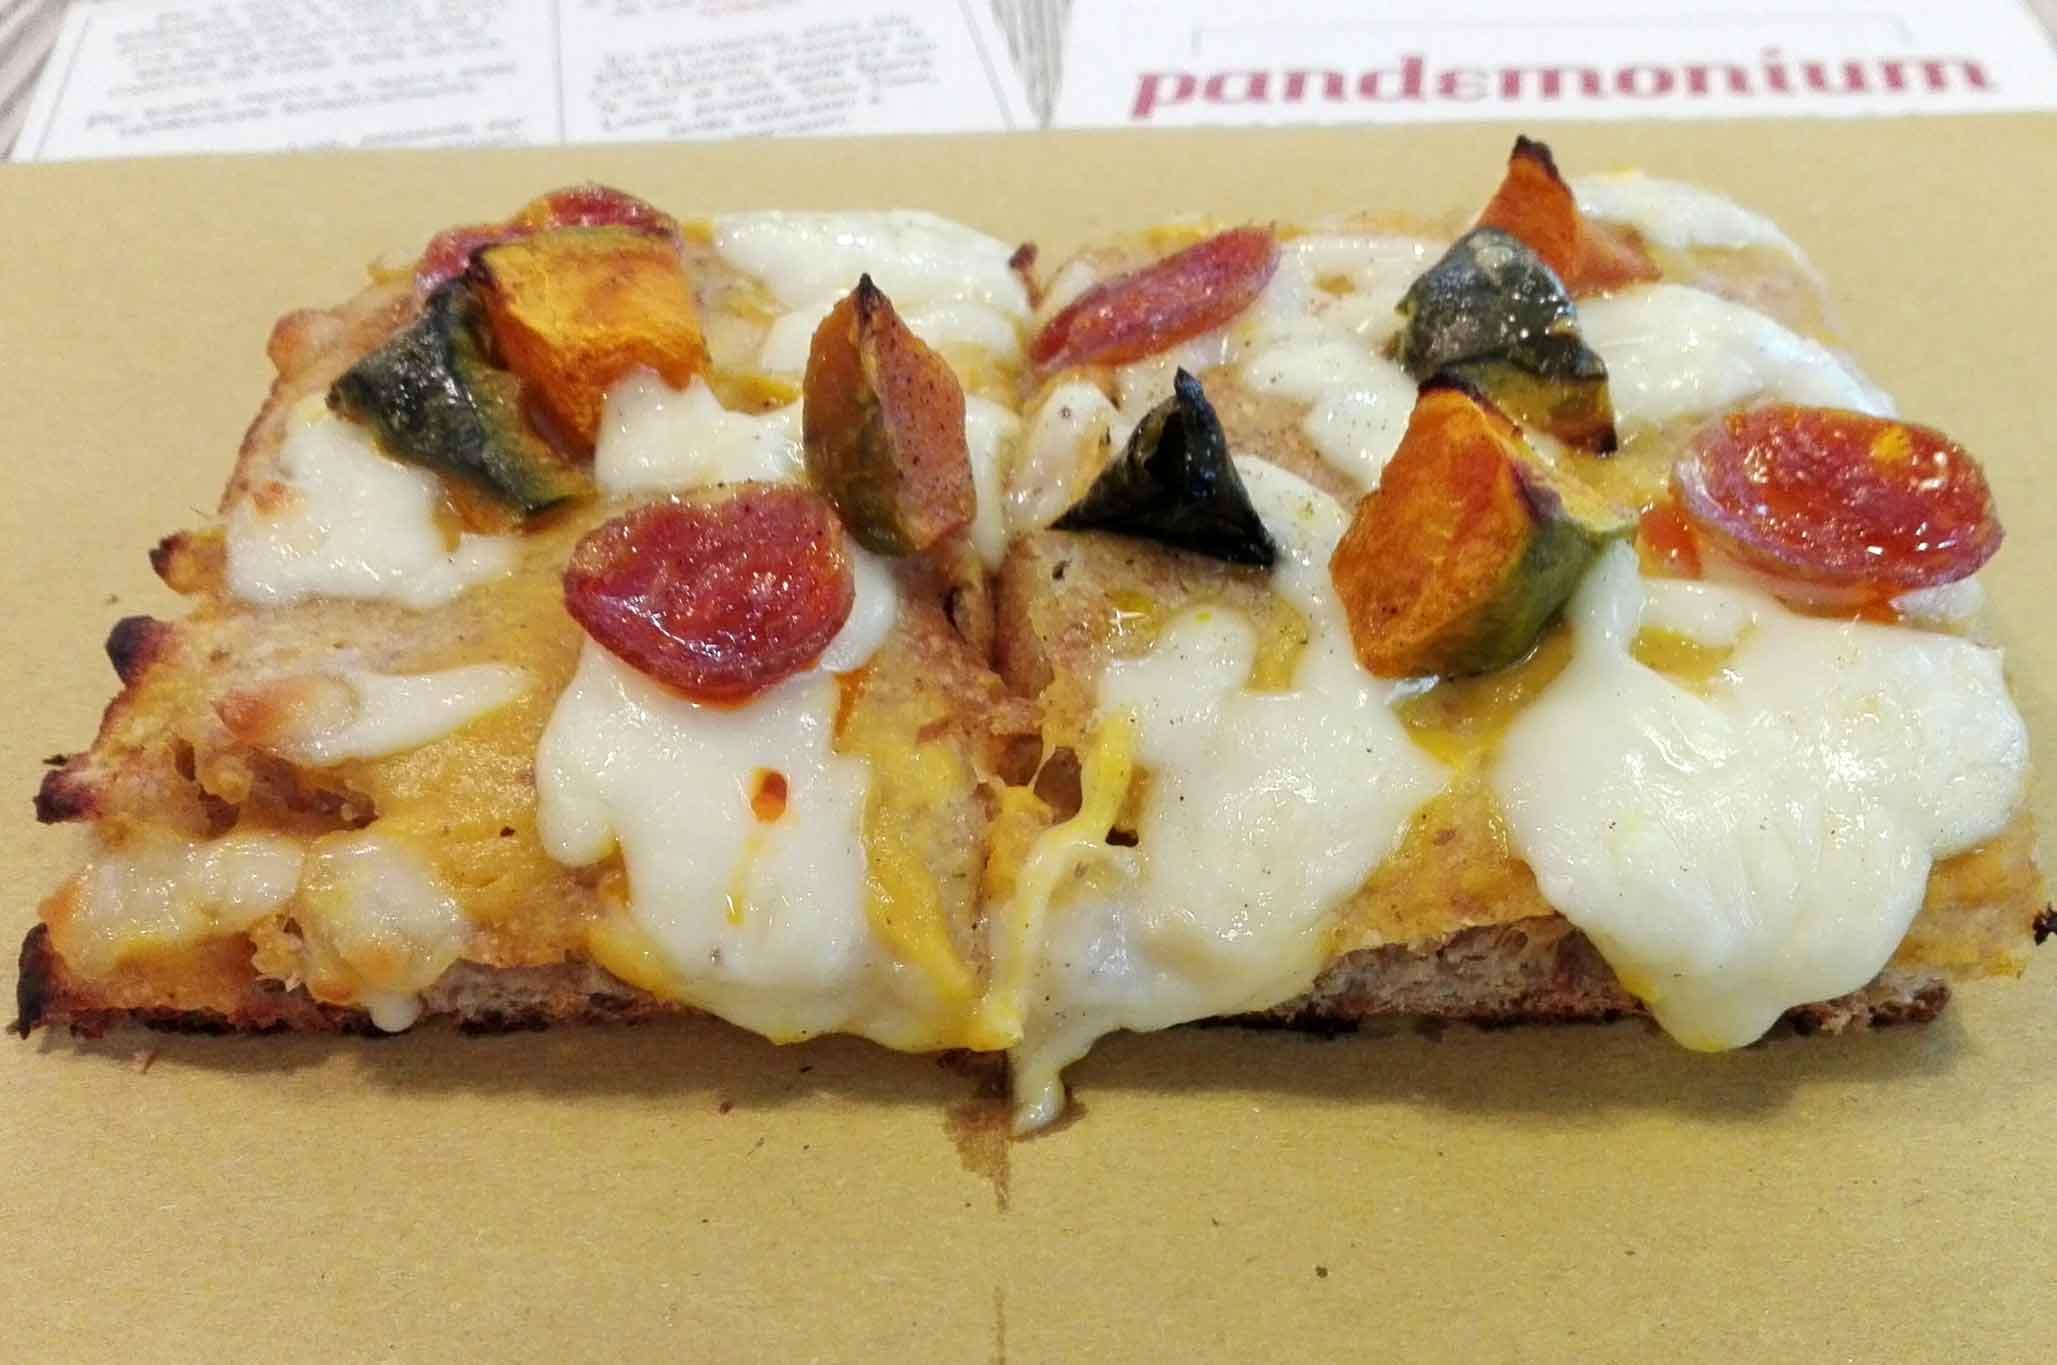 pandemonium-pizza-trancio-bufala-pomodoro